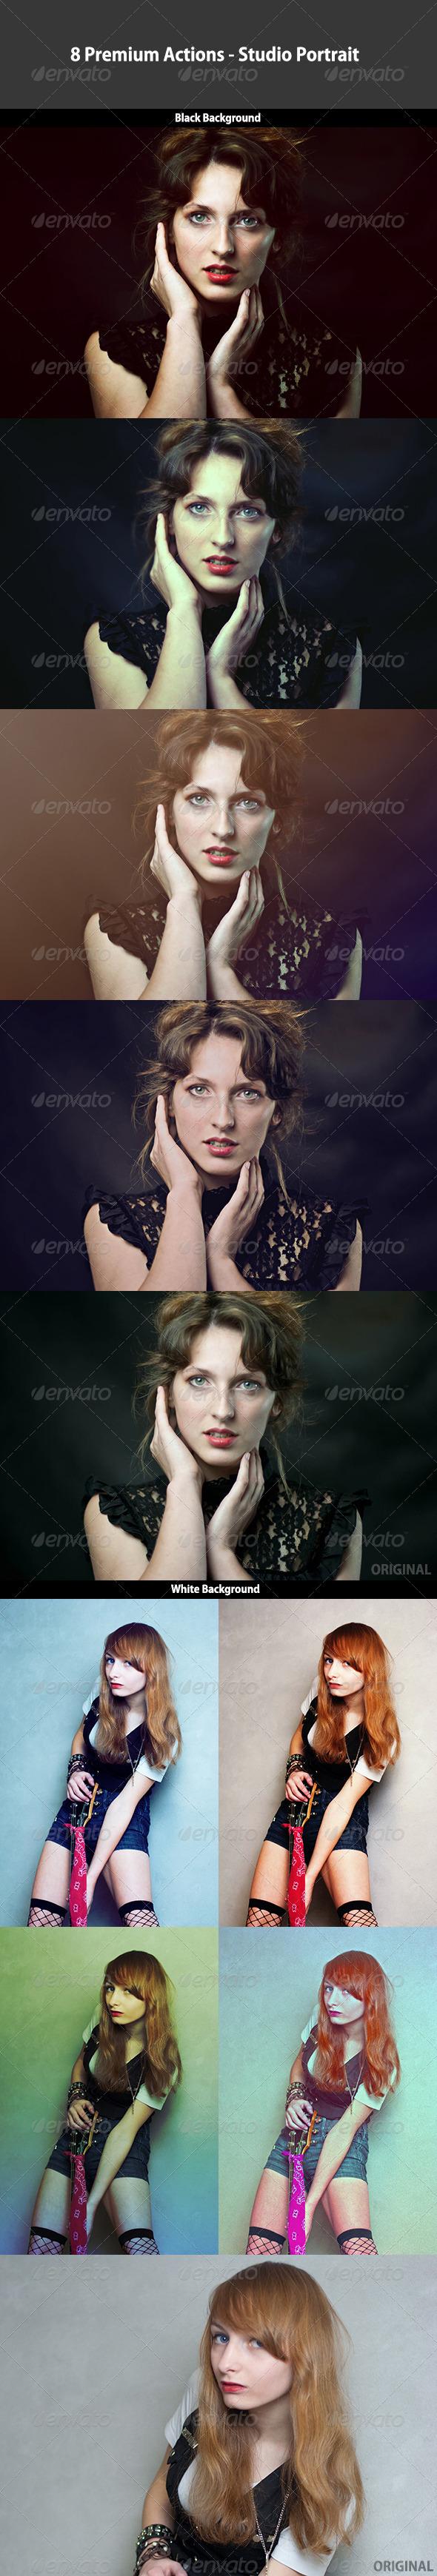 GraphicRiver 8 Premium Actions Studio Portrait 4983806